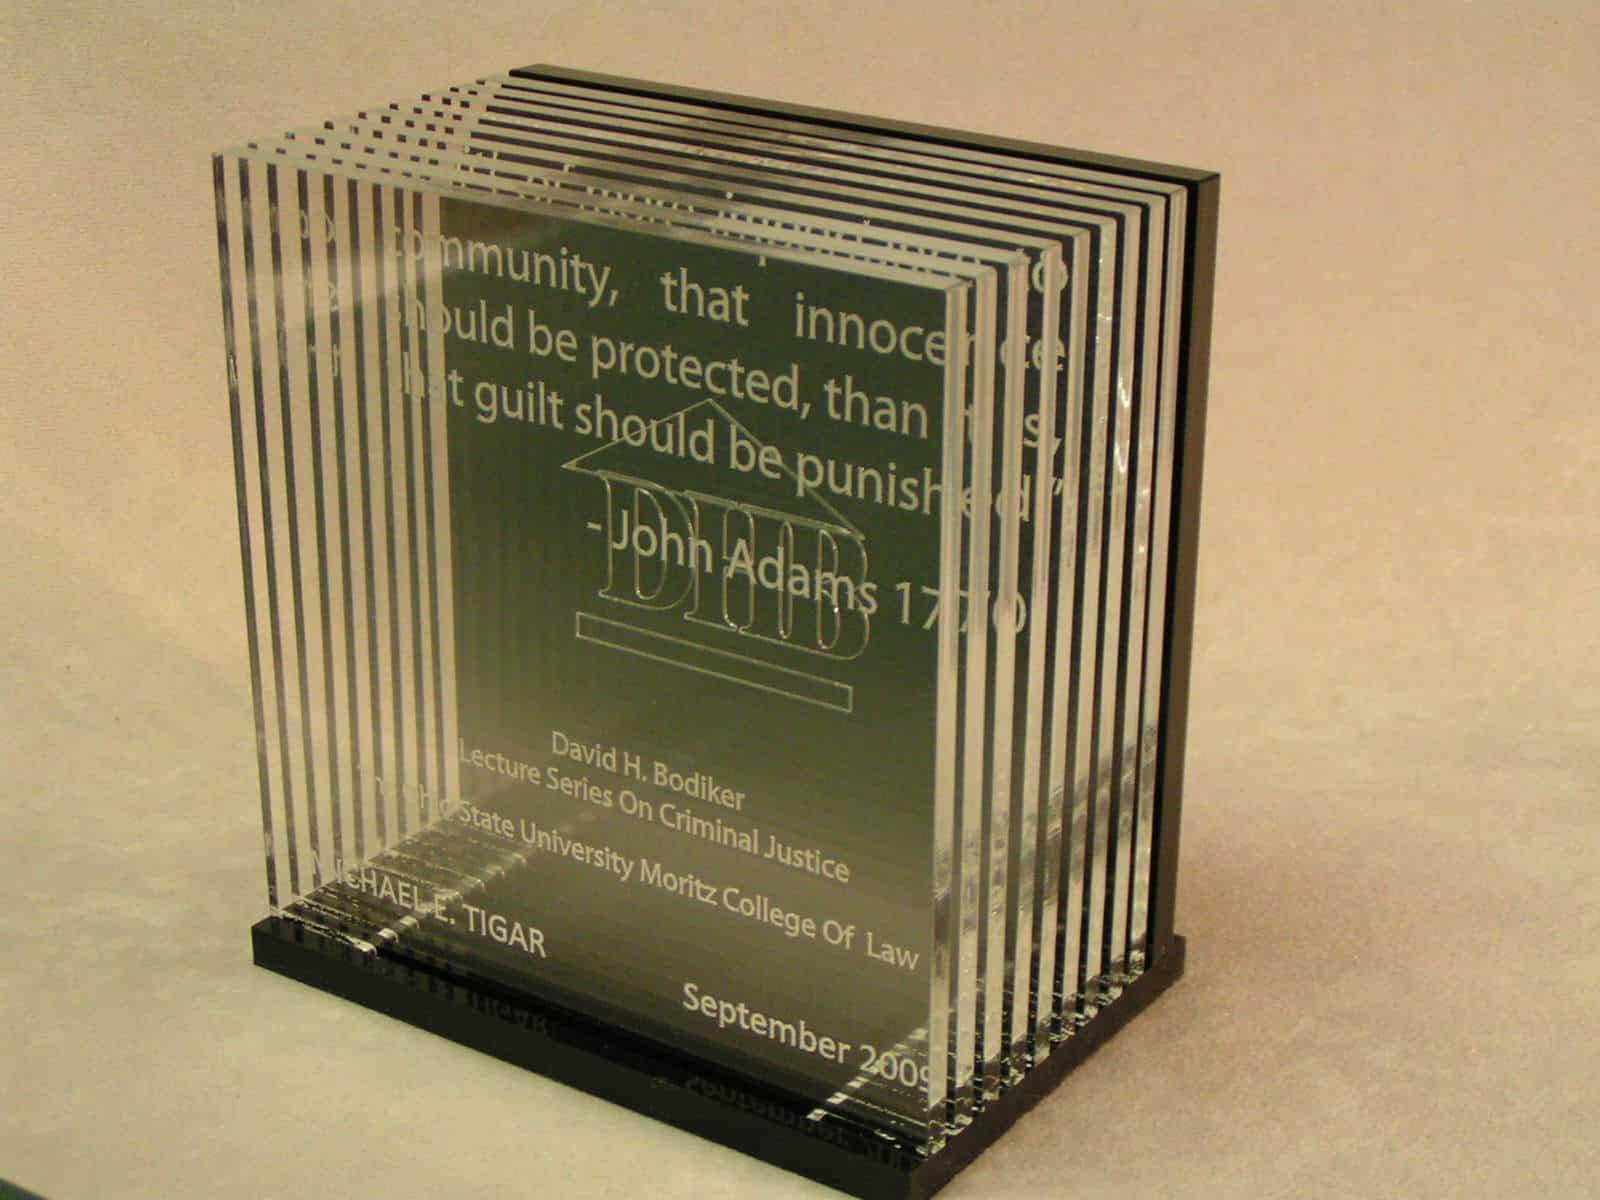 Laser Cut Engraved Award